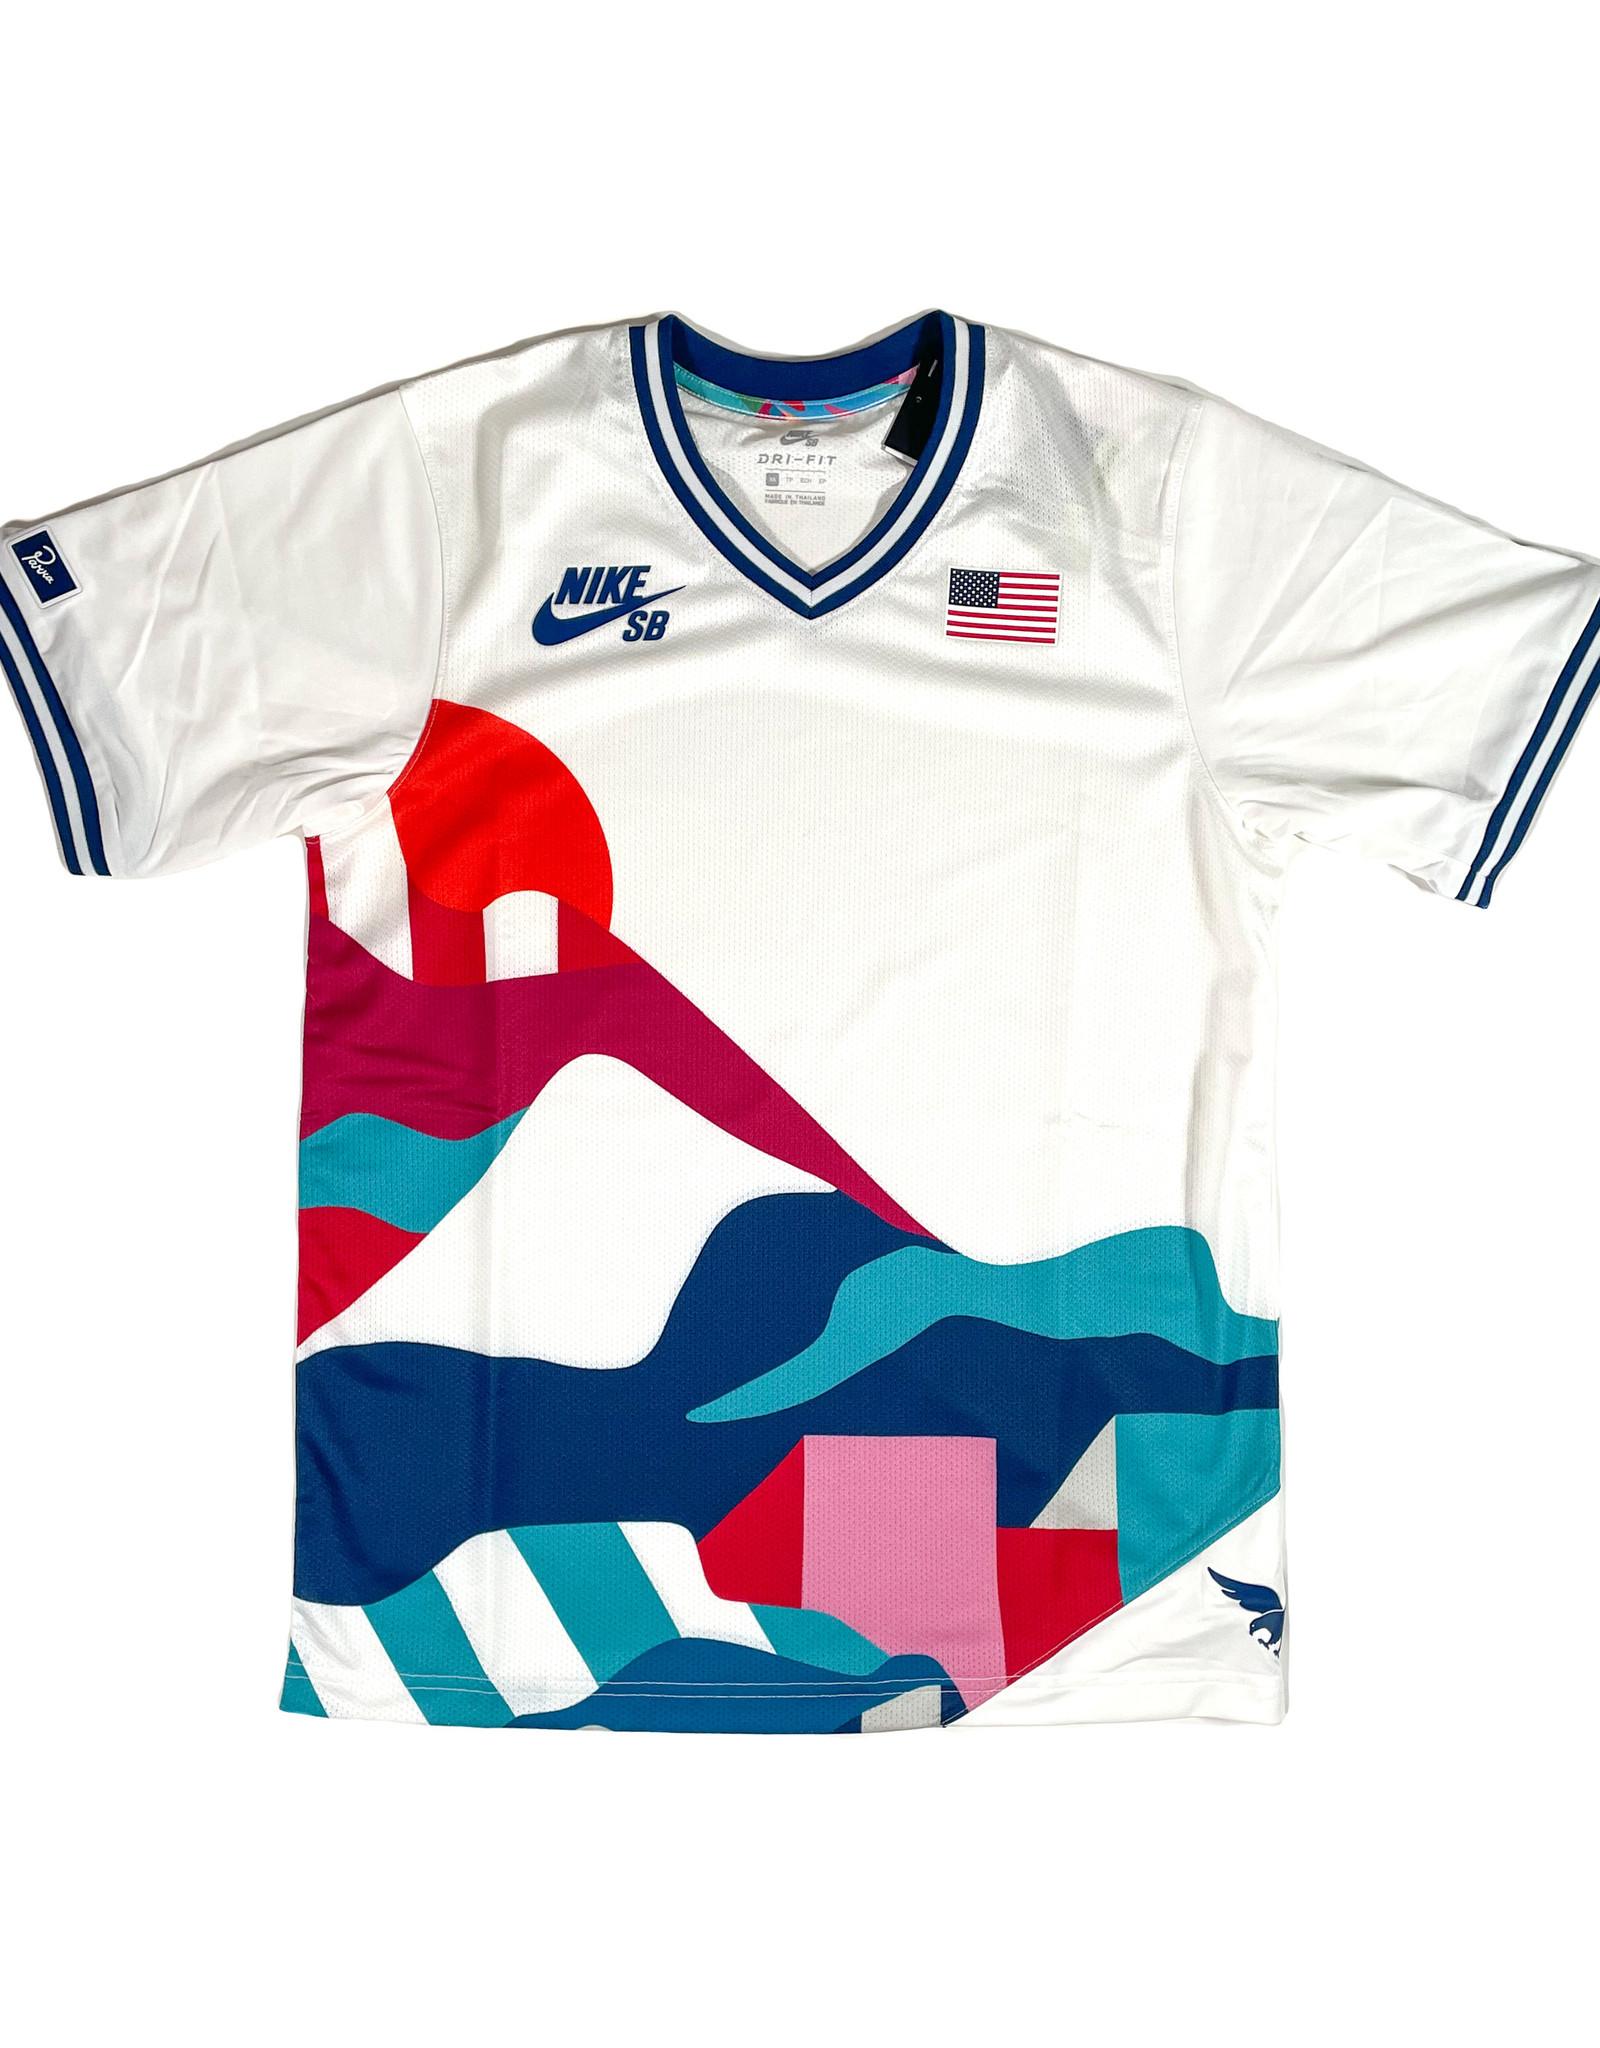 NIKE NIKE SB U.S.A SHIRT - WHITE/BRAVE BLUE